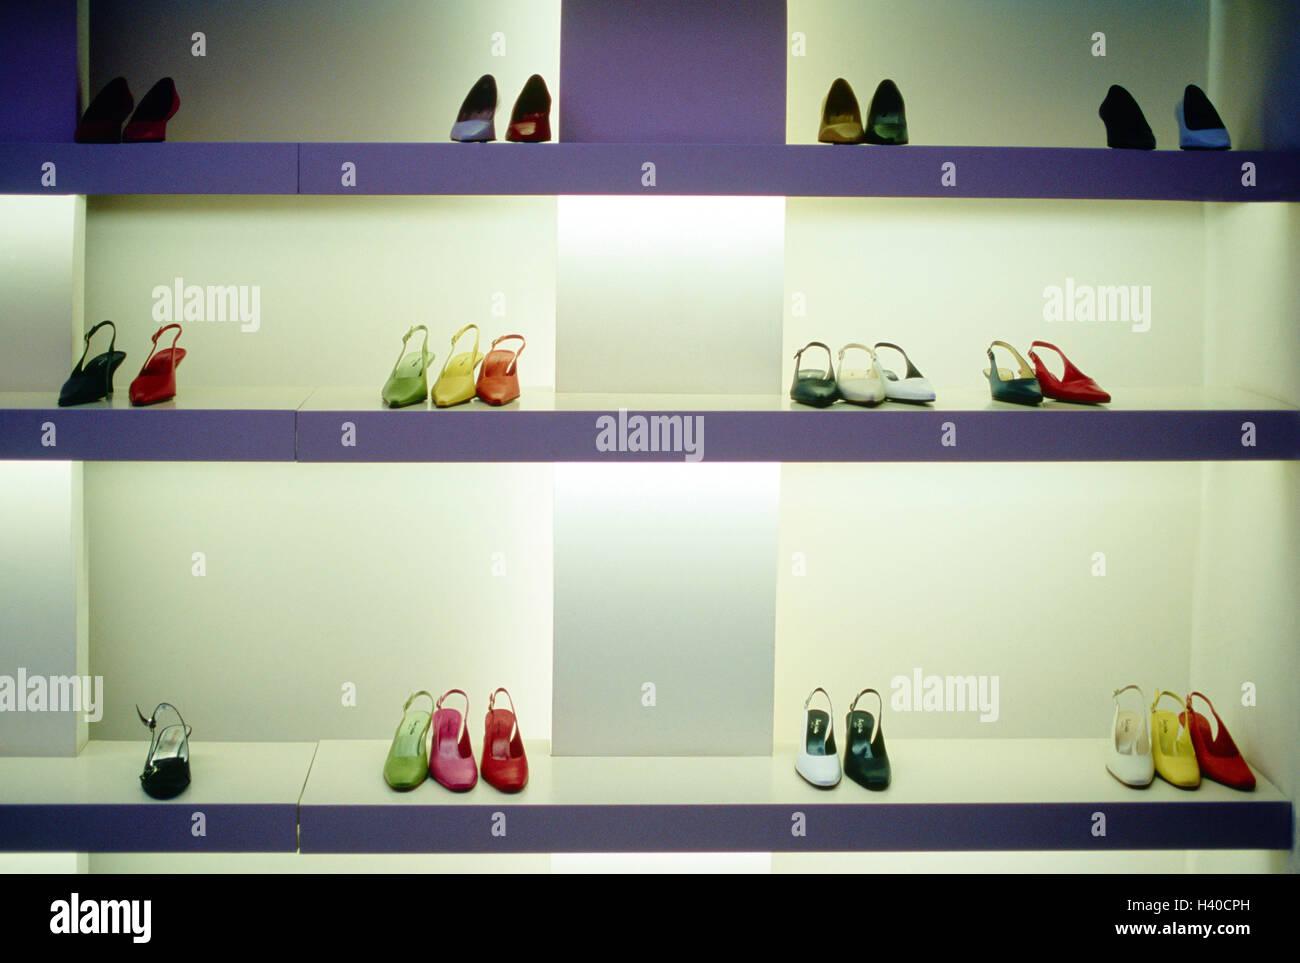 Shoe store bdb9b9915a